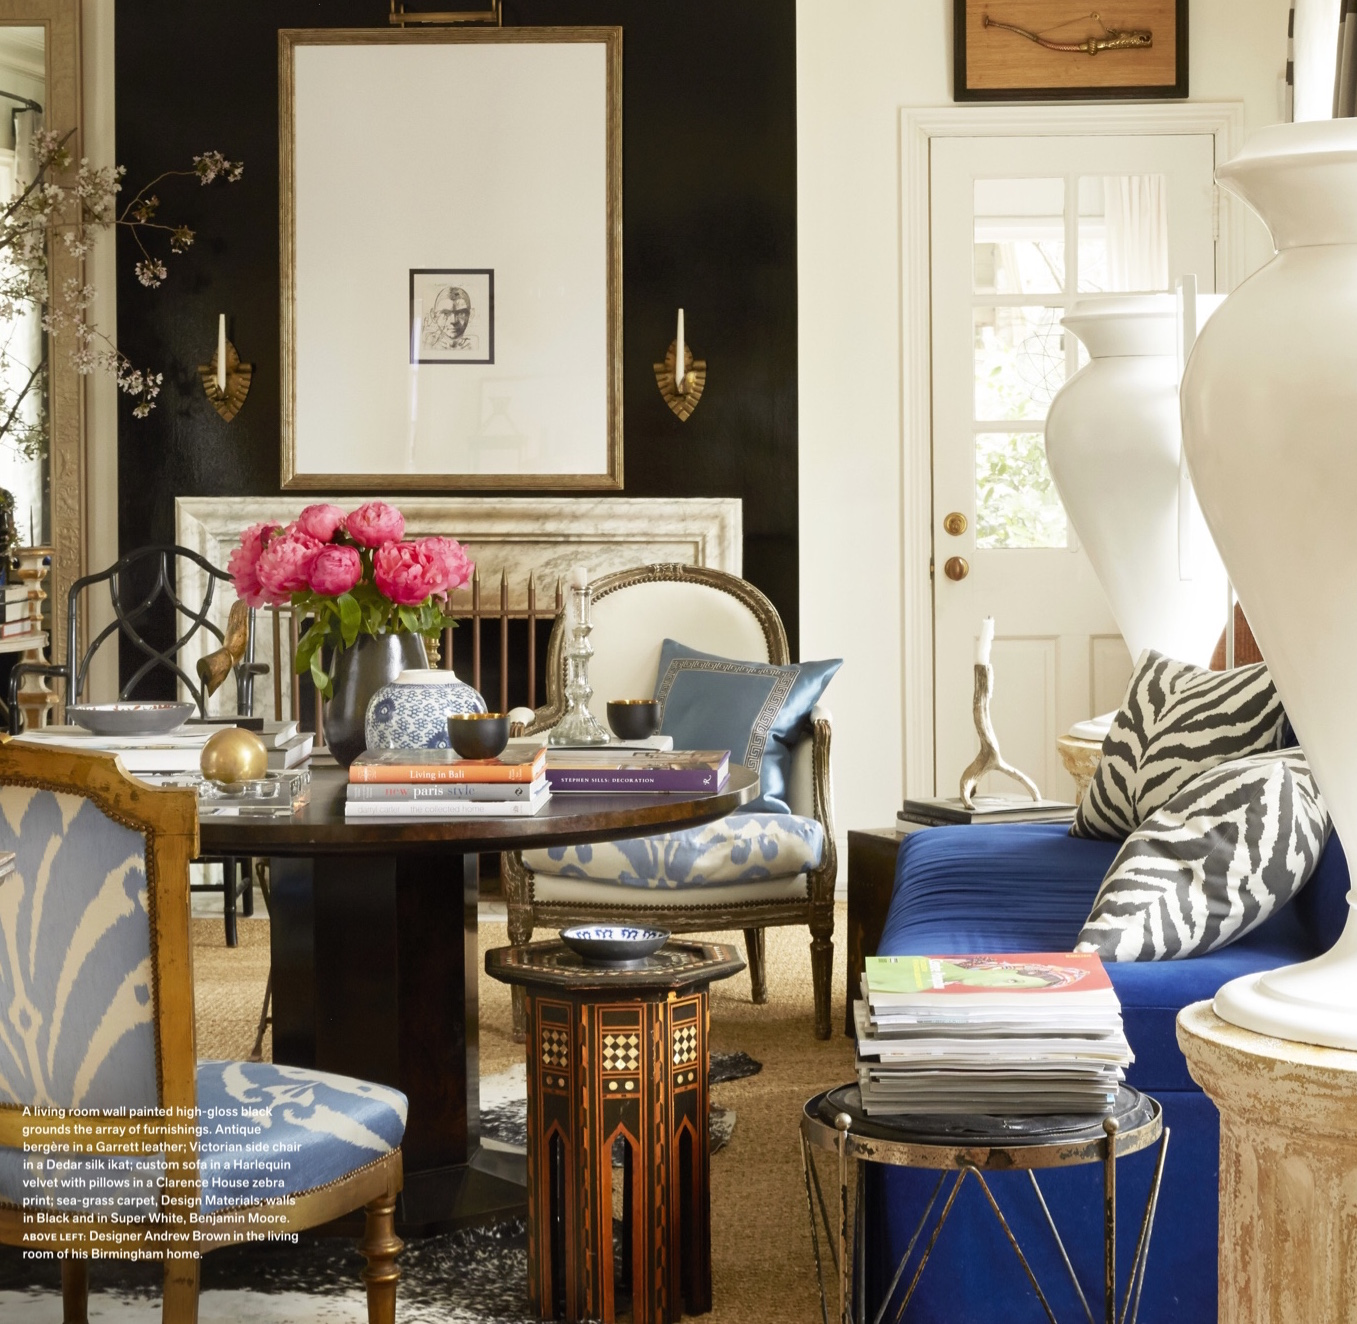 Interior Decorating Bookshelves: Splendid Sass: INTERIOR DESIGN